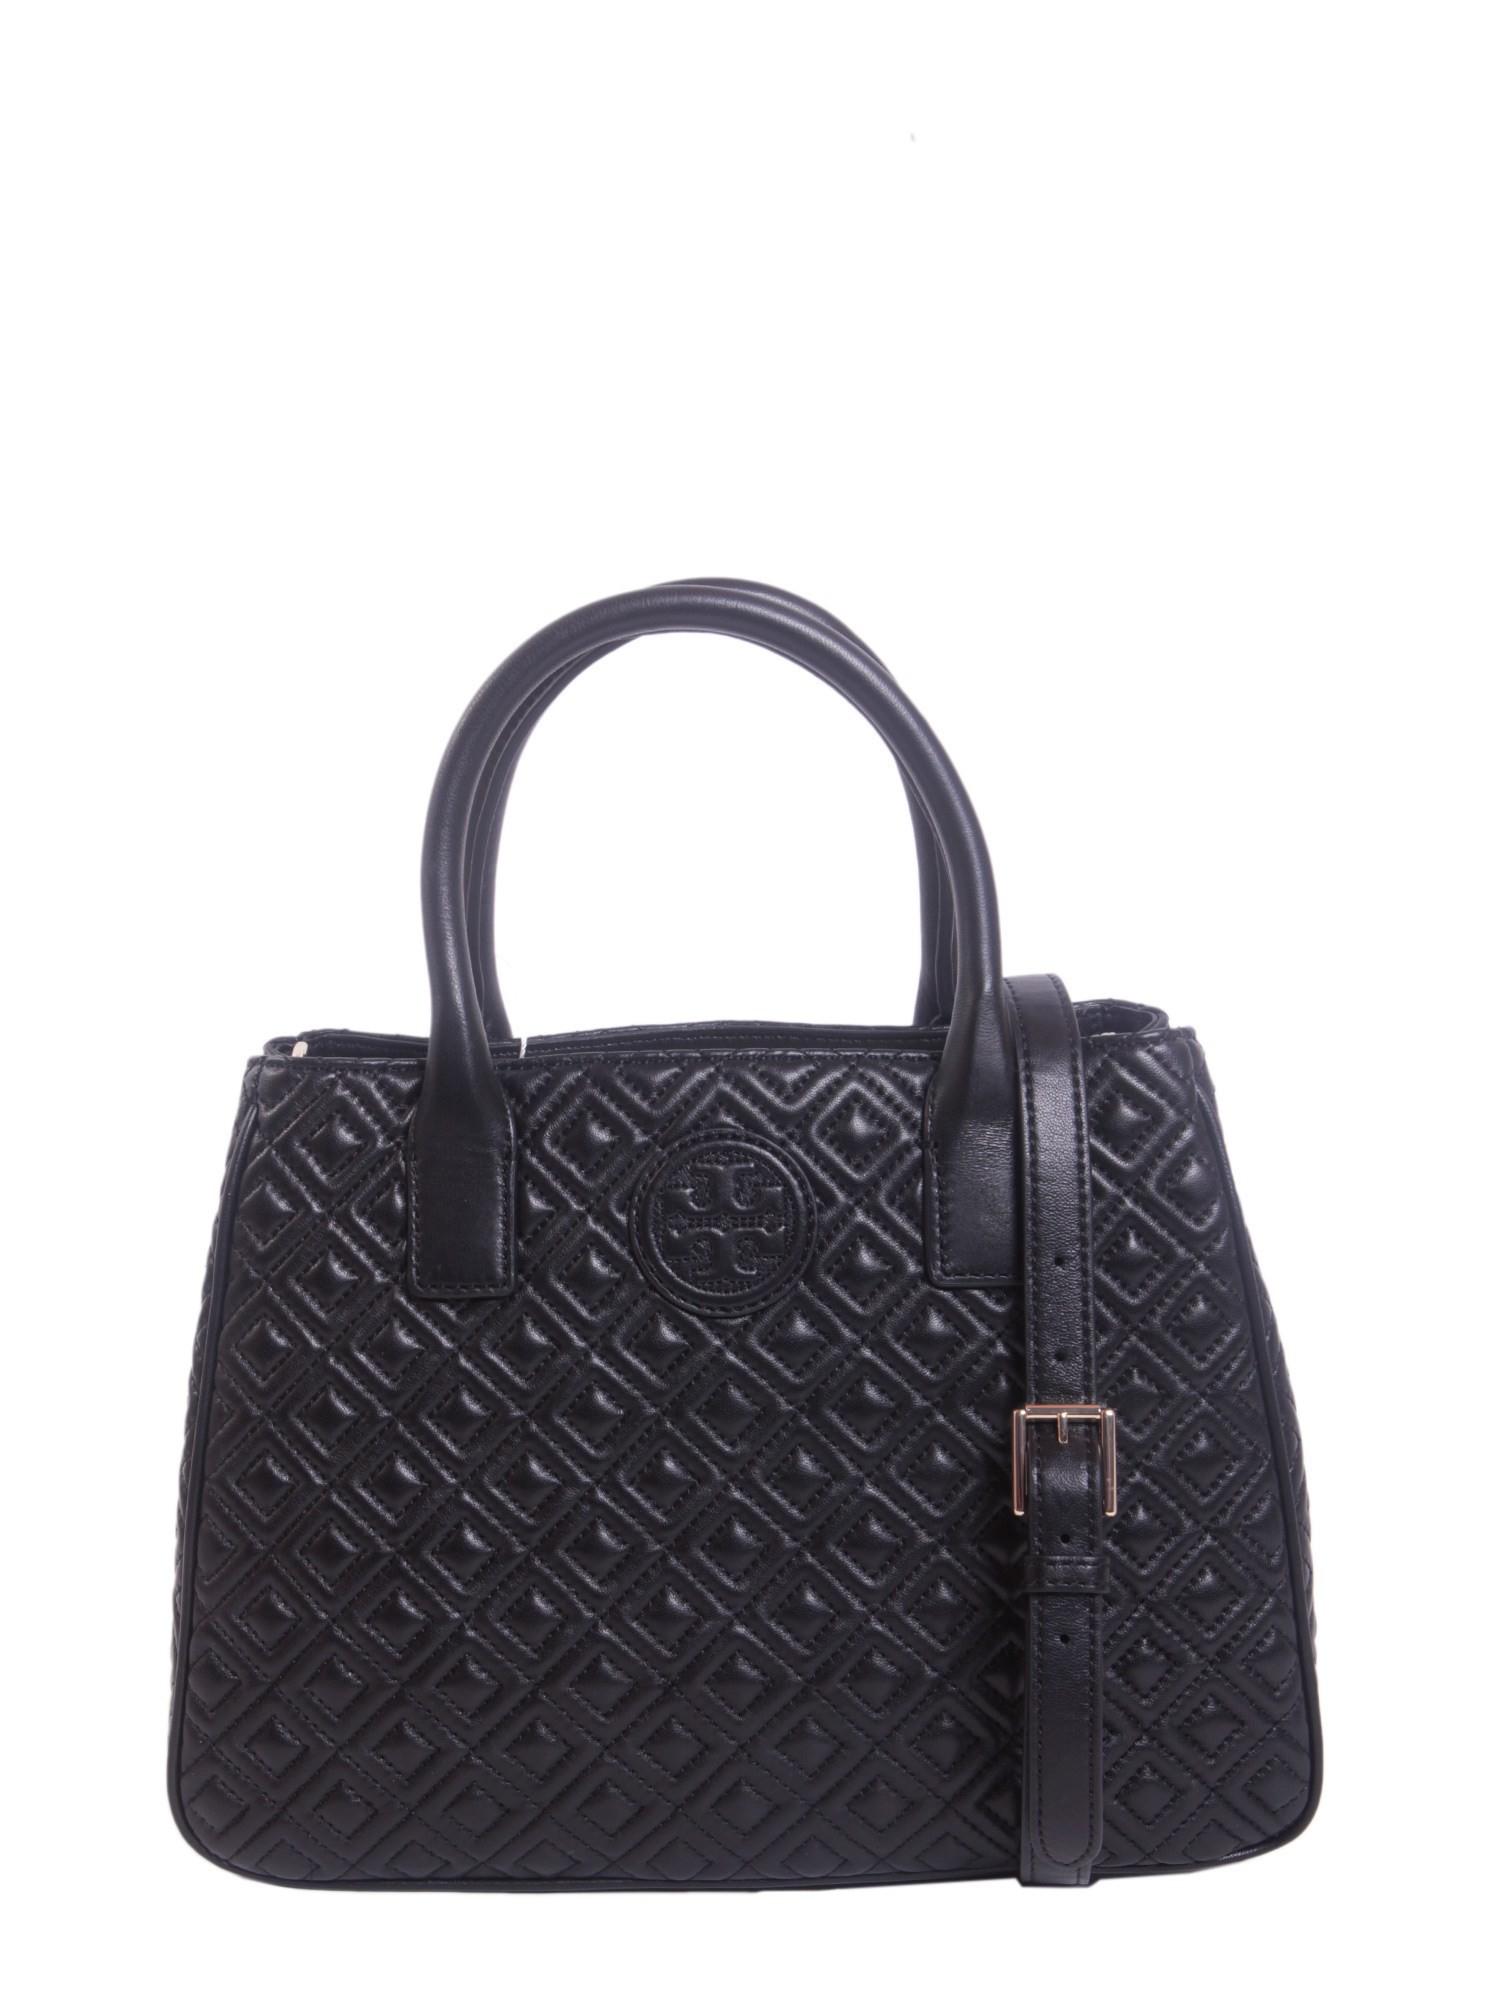 Tory Burch Marion Bag In Black Nero Lyst